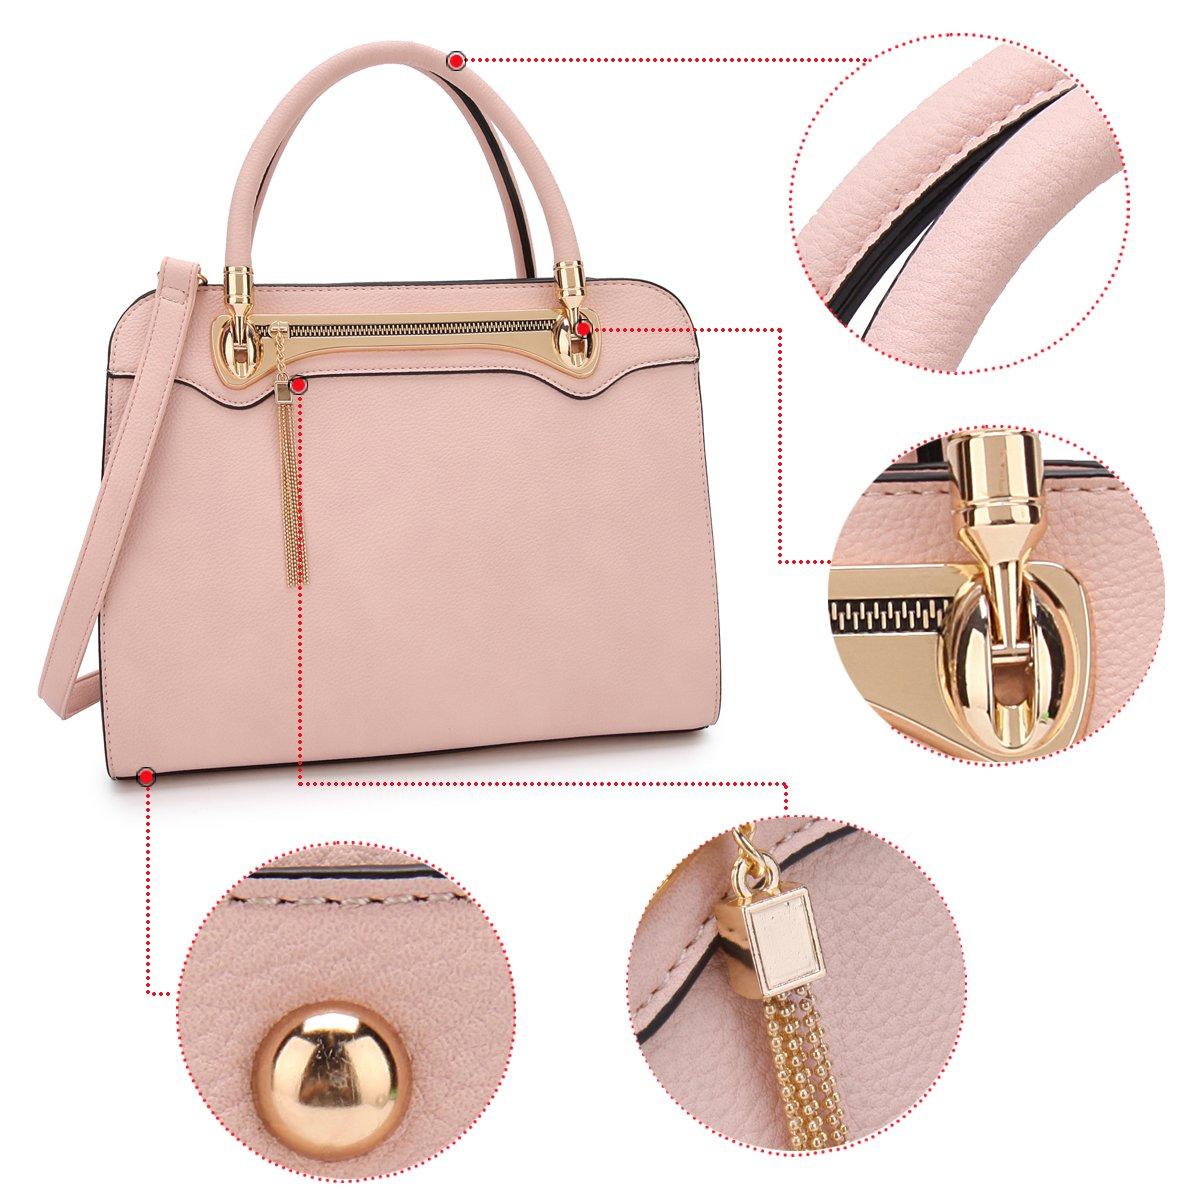 Women Structured Satchel Bags Vegan Leather Handbag Top Handle Purse Fashion Shoulder Bag with Fringed Tassel by Dasein (Image #4)